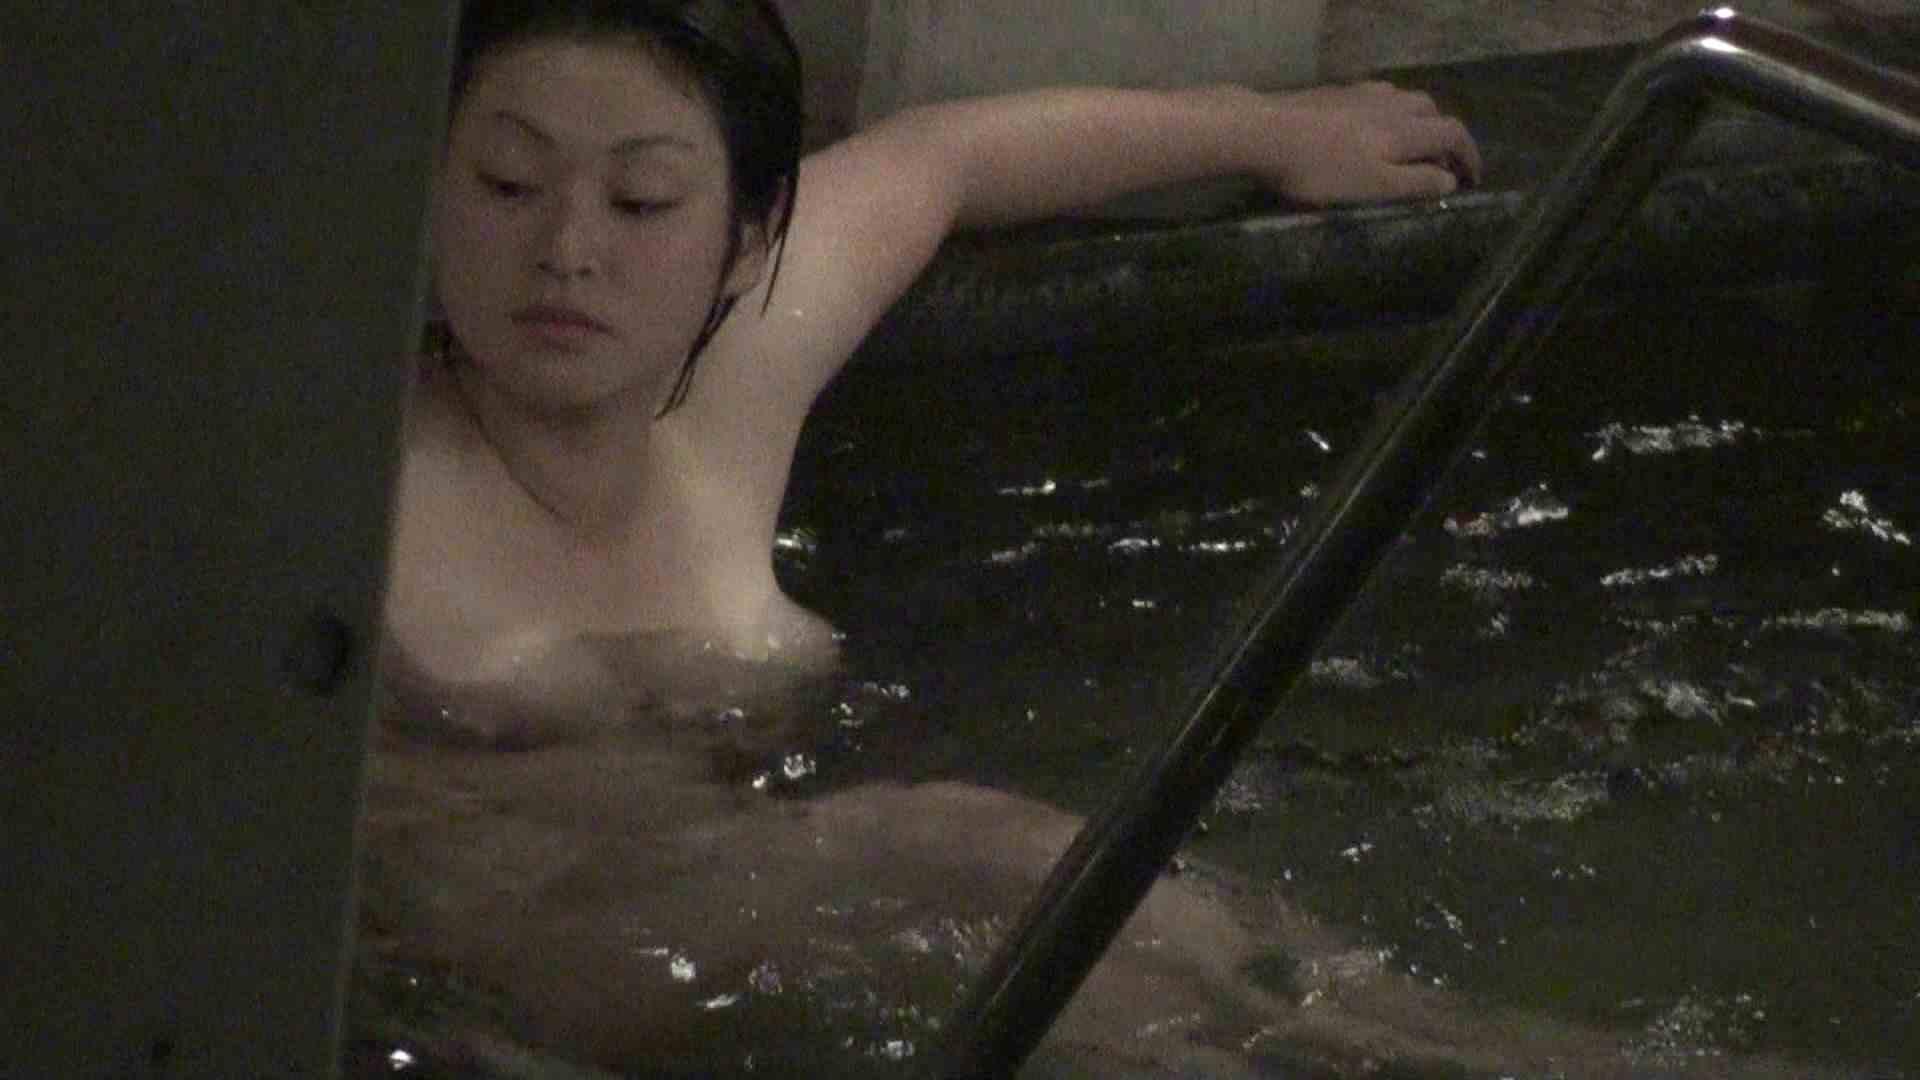 Aquaな露天風呂Vol.338 露天風呂編 | 盗撮シリーズ  82PIX 51